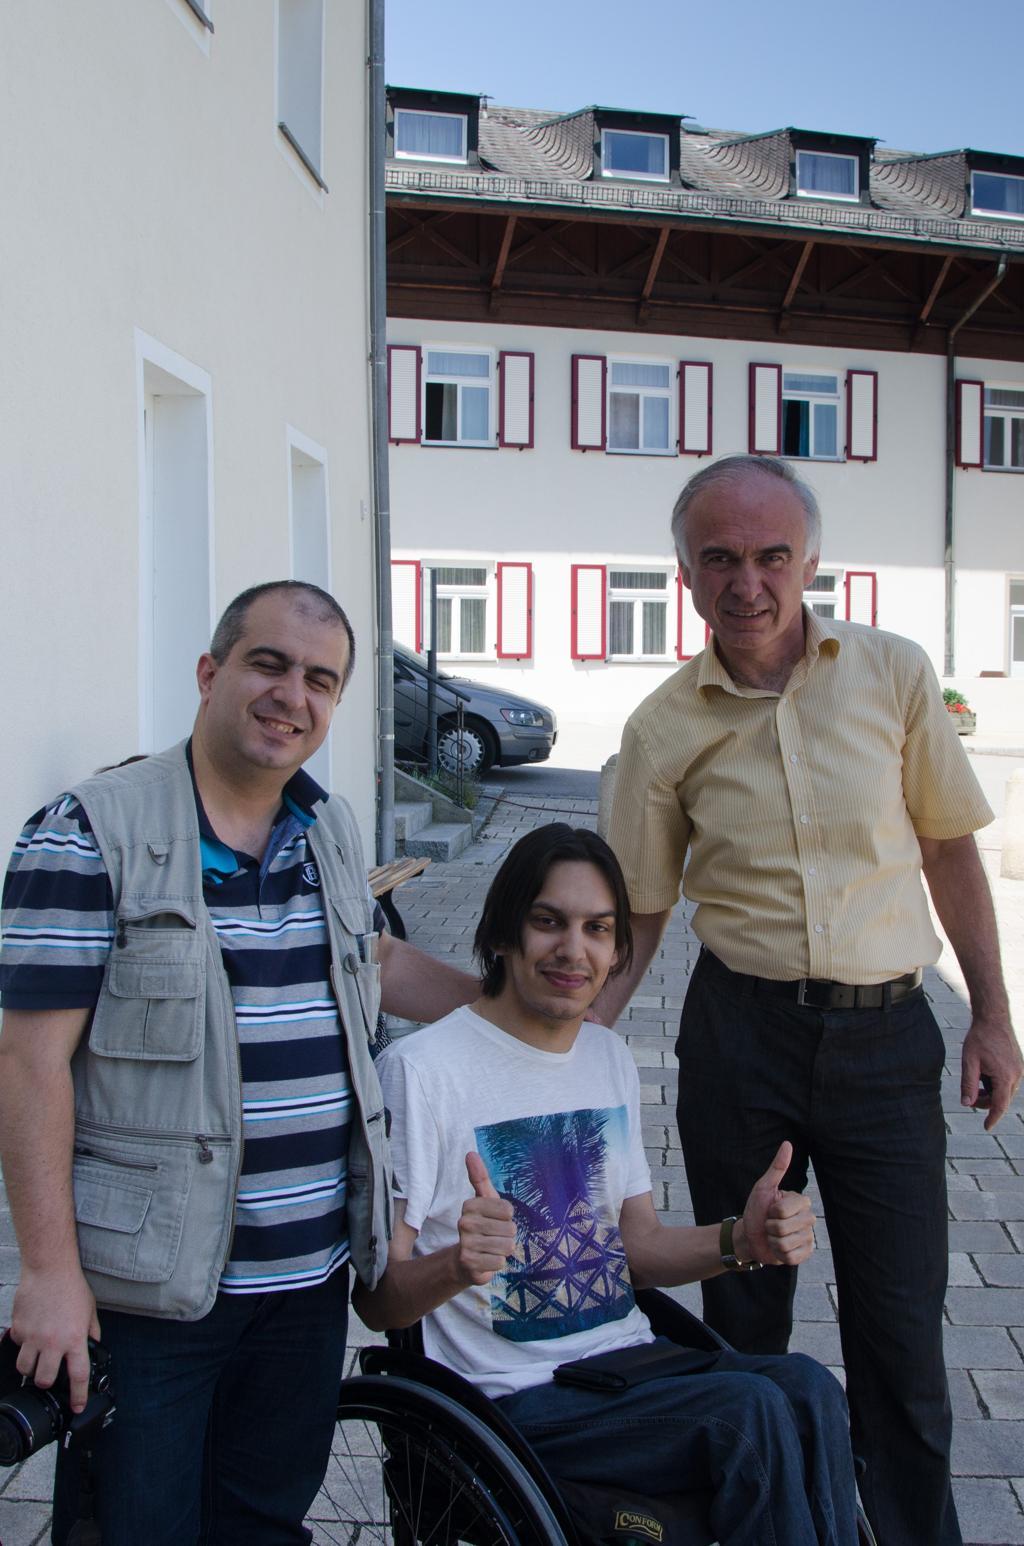 Nikola i prijatelji iz Libanona i Njemačke